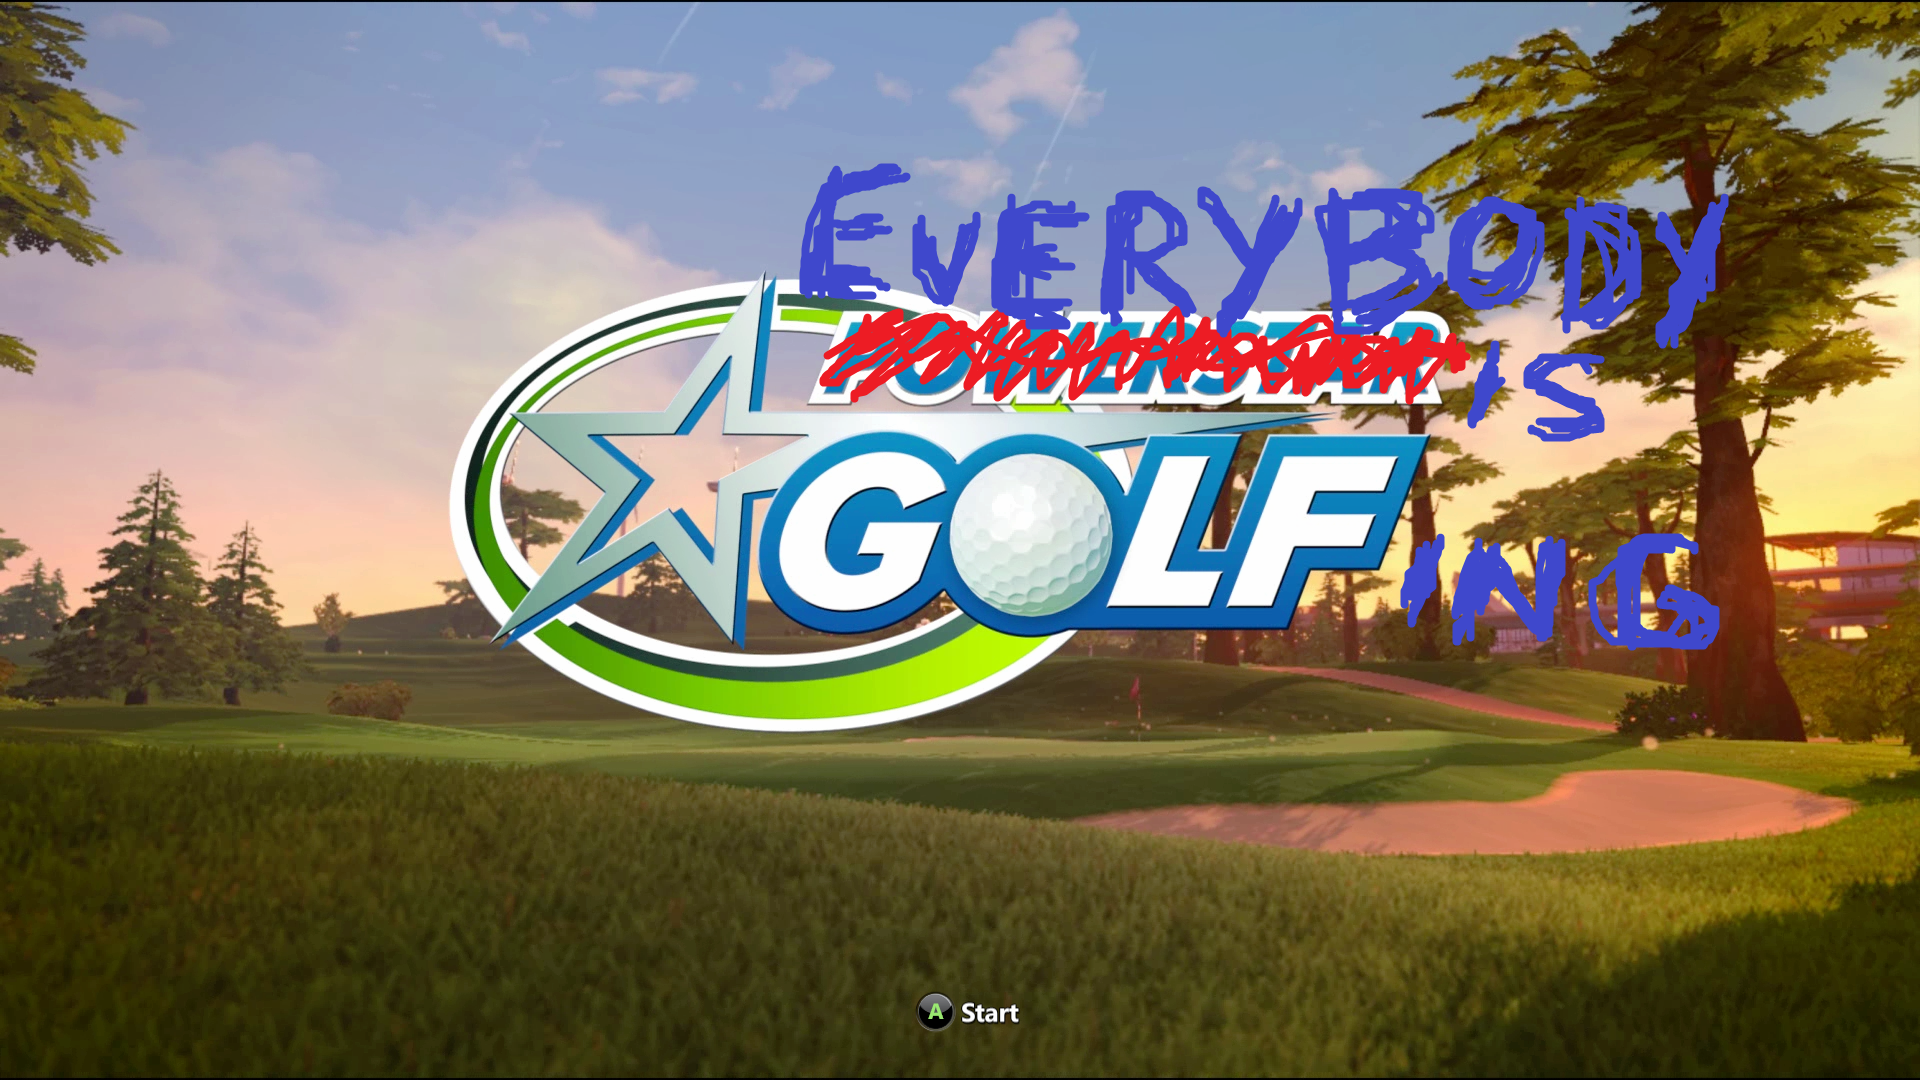 Look! Now everybody is golfing!